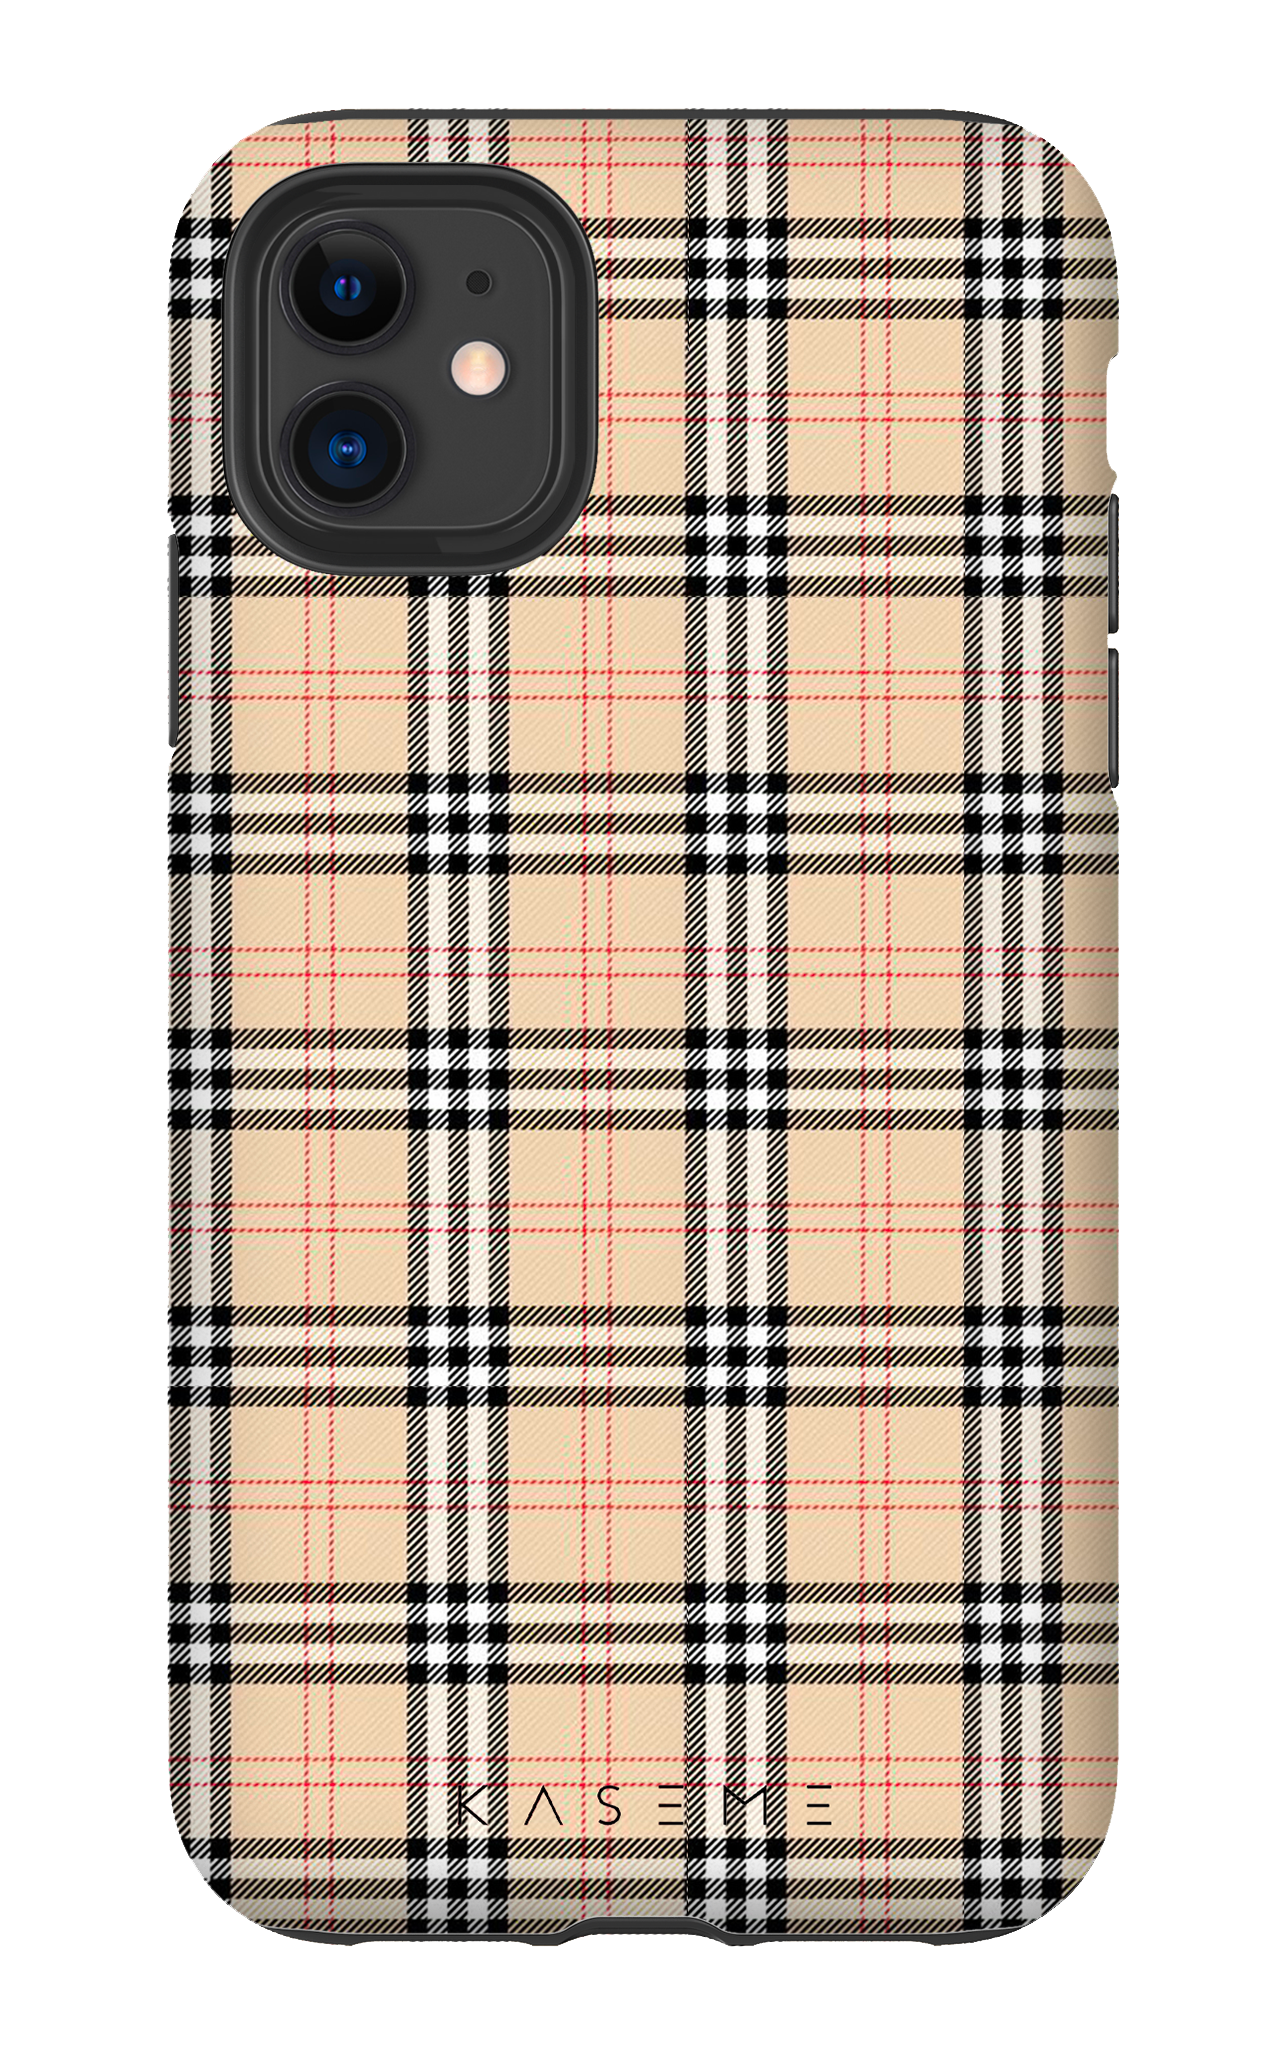 Posh phone case